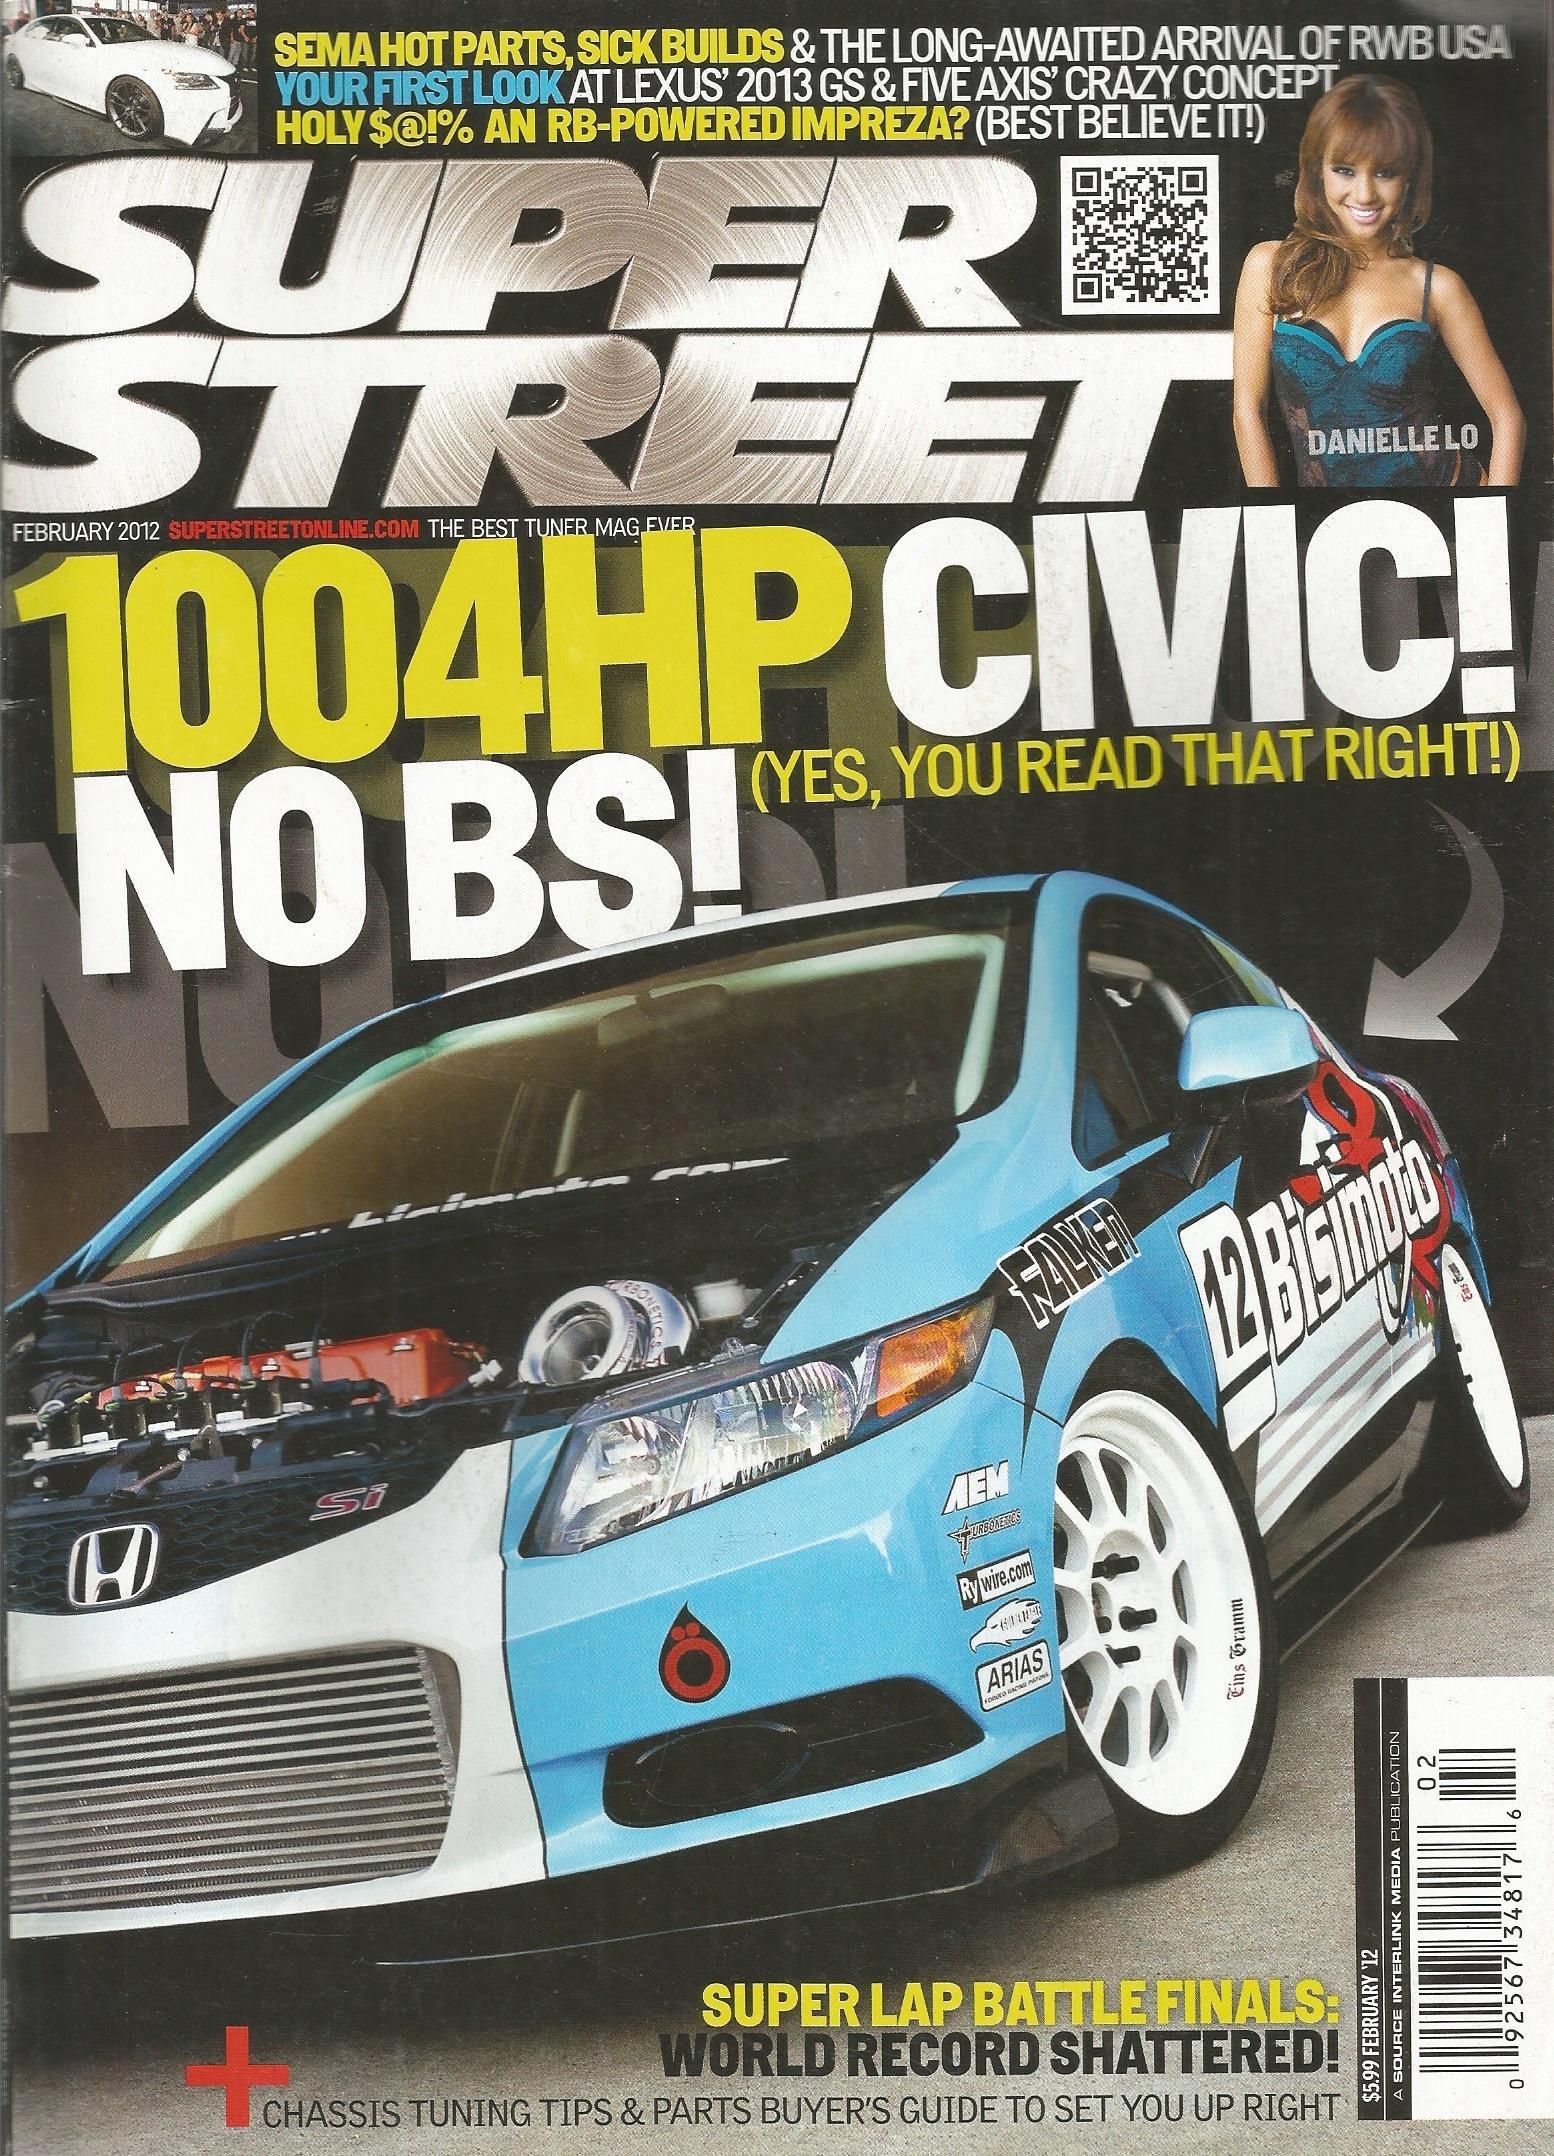 Super Street Magazine February 2012+1004HP Civic Cover+Victoria Mai Centerfold+2013 Lexus GS F Sport+alot more... pdf epub